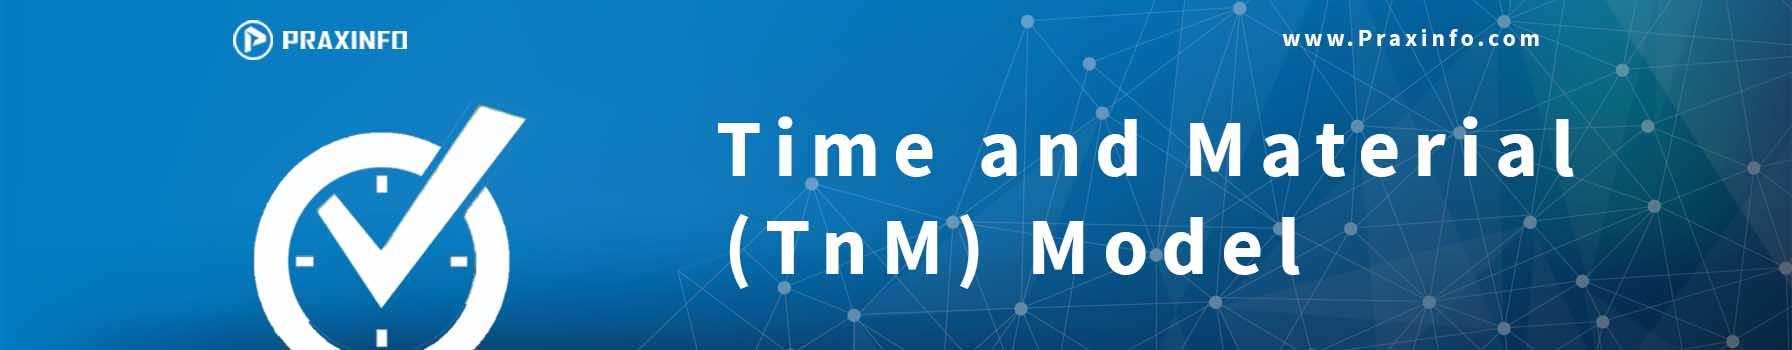 timemetarial.jpg